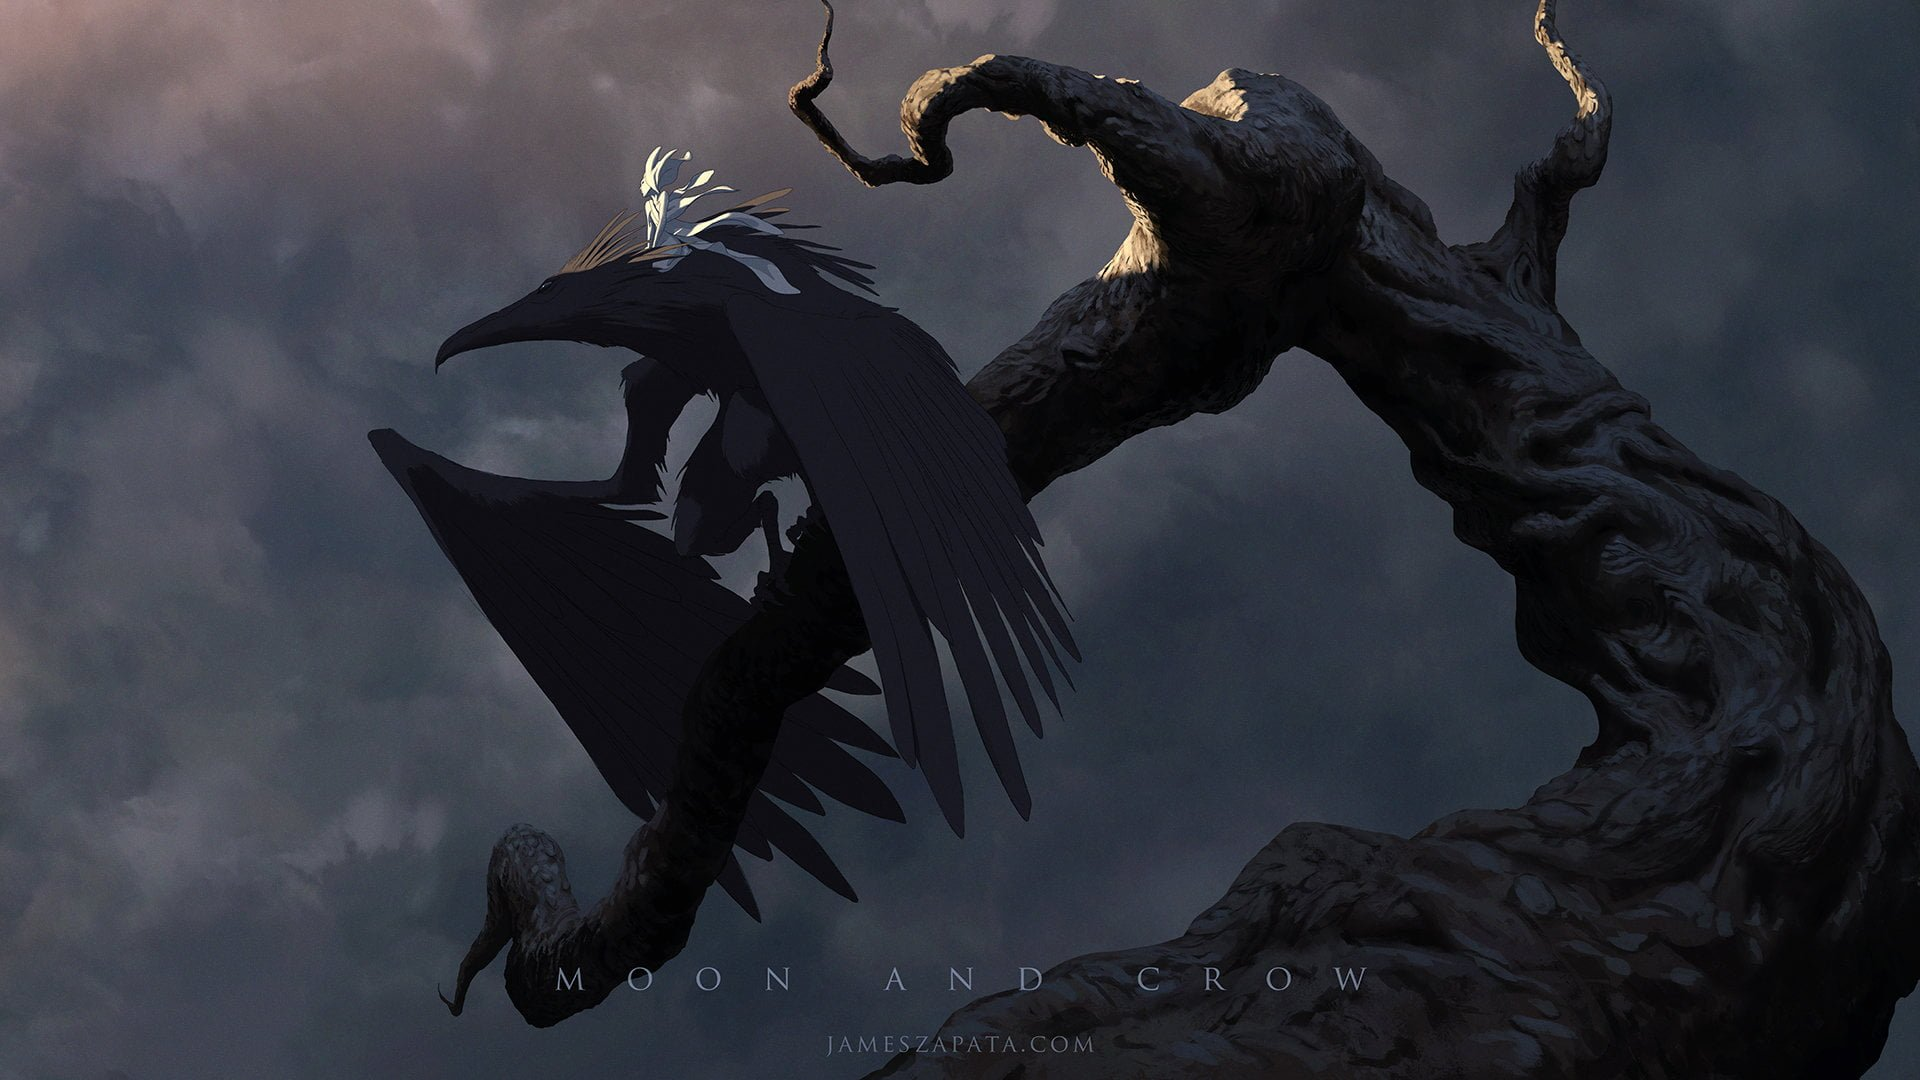 Moon and Crow movie scene artwork digital art James Zapata 1920x1080